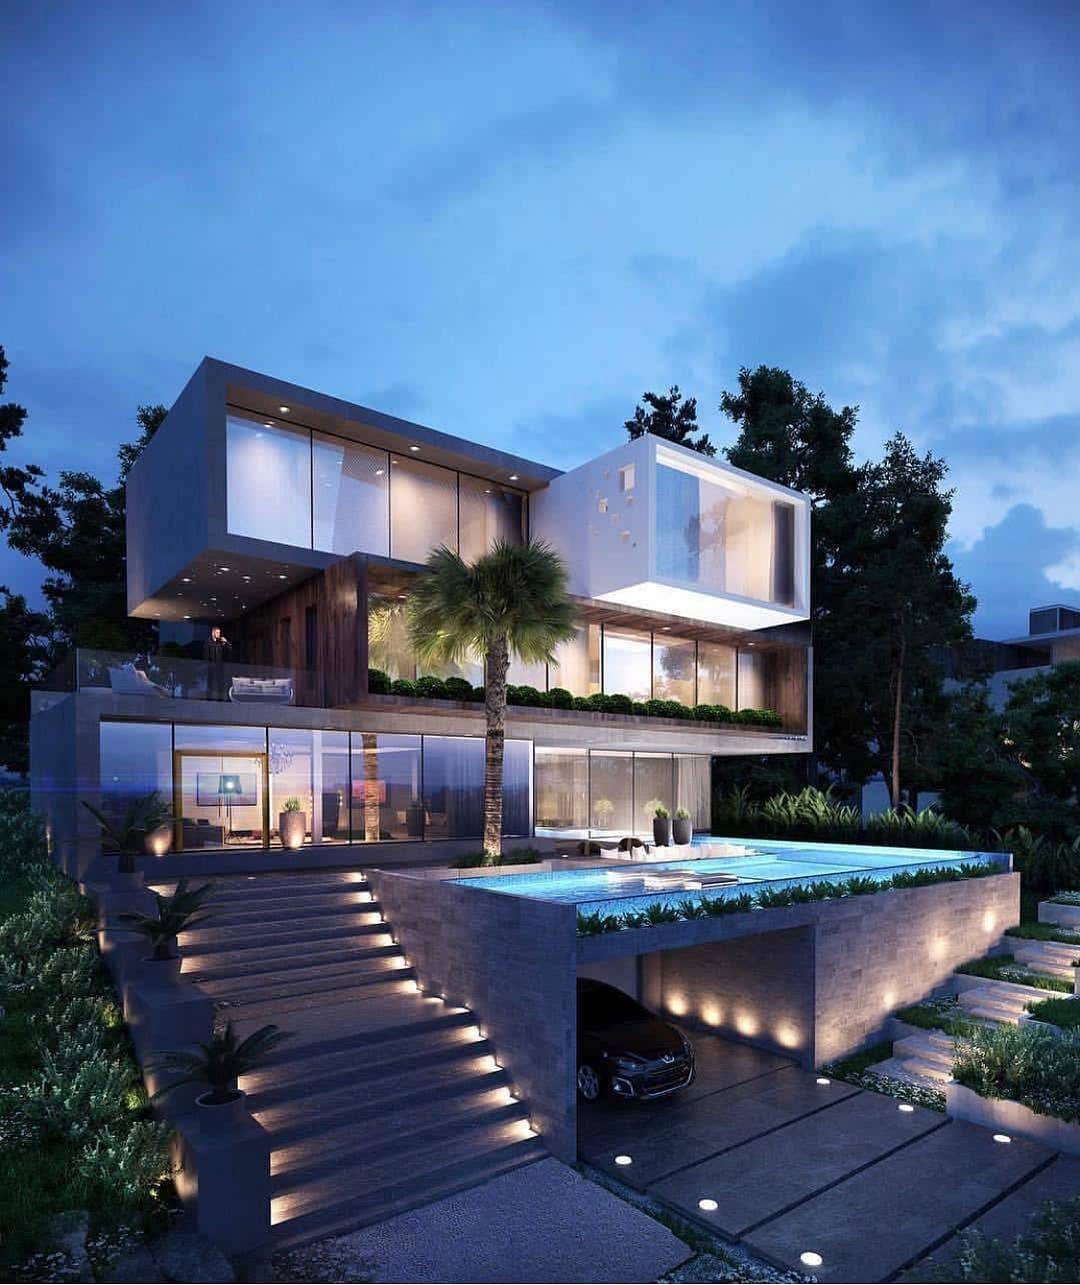 "нoмeѕ🏡ᴍᴀɴsɪᴏɴs🏘 ʜᴏᴜsᴇs🏠 on Instagram: ""I love this modern design🔝😍Do you like it⁉ Yes ore No? Via @fanciest.architecture"" – Modern Dream Hause"